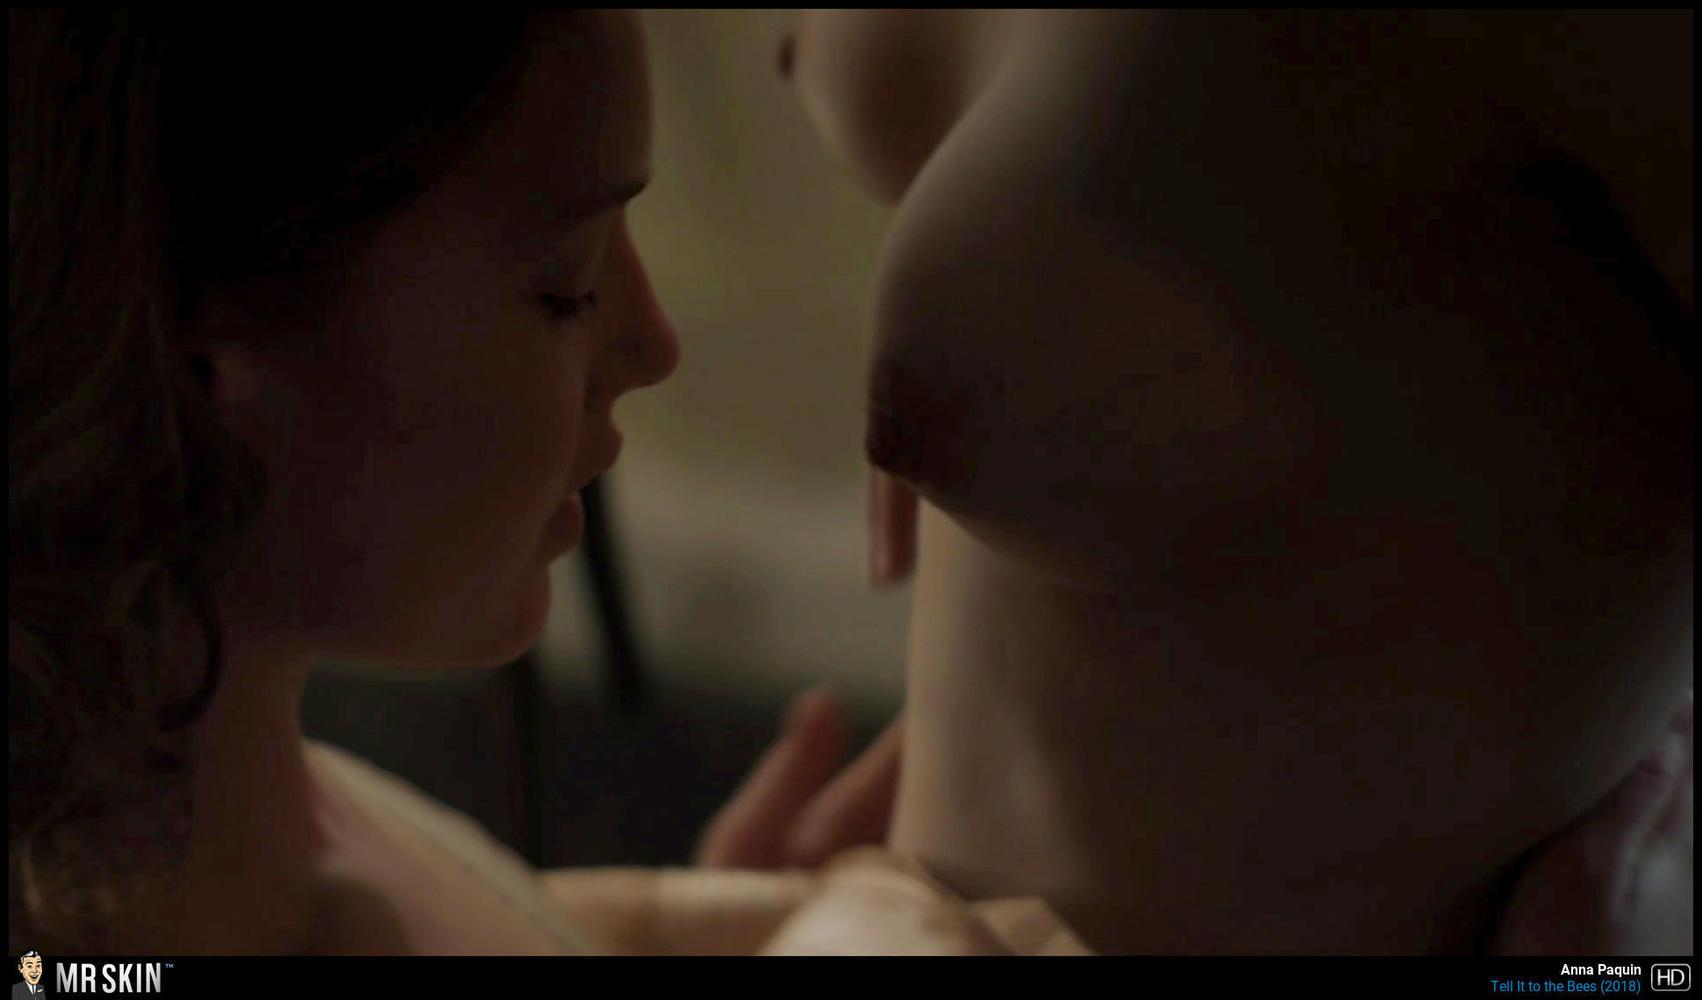 Lesbisk sex scener fra filmer